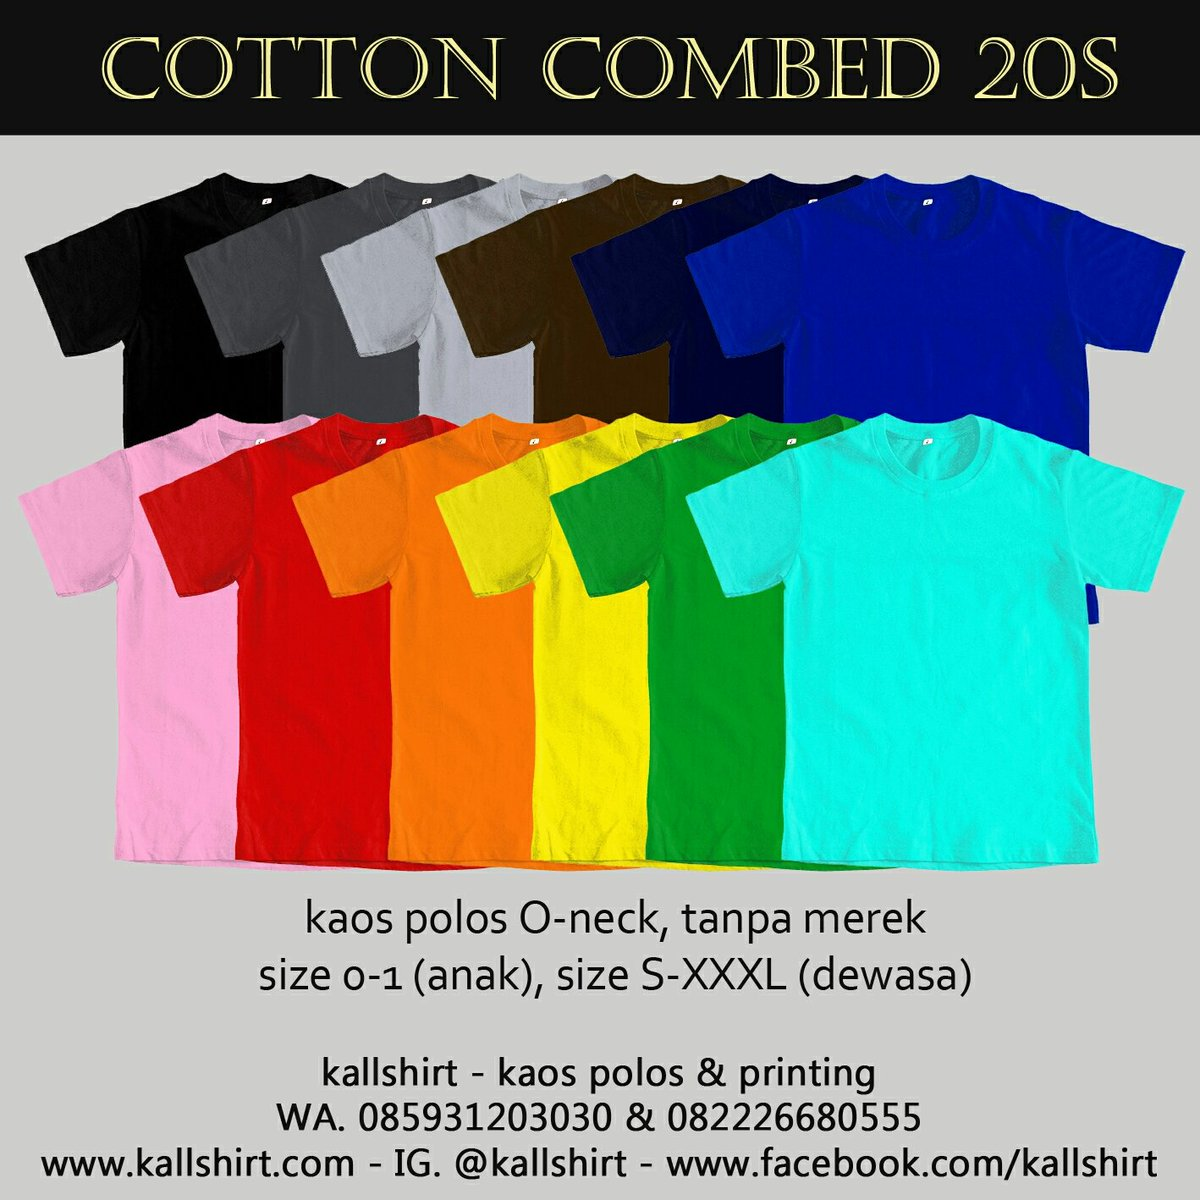 Ani W Suhartono Ws Twitter Size M Kaos Polos Cotton Combed 20s Hitam Tanpa Merek Hanya Rp 26500 Lihat Gambar Klik Https Tokopediacom Kallshirt